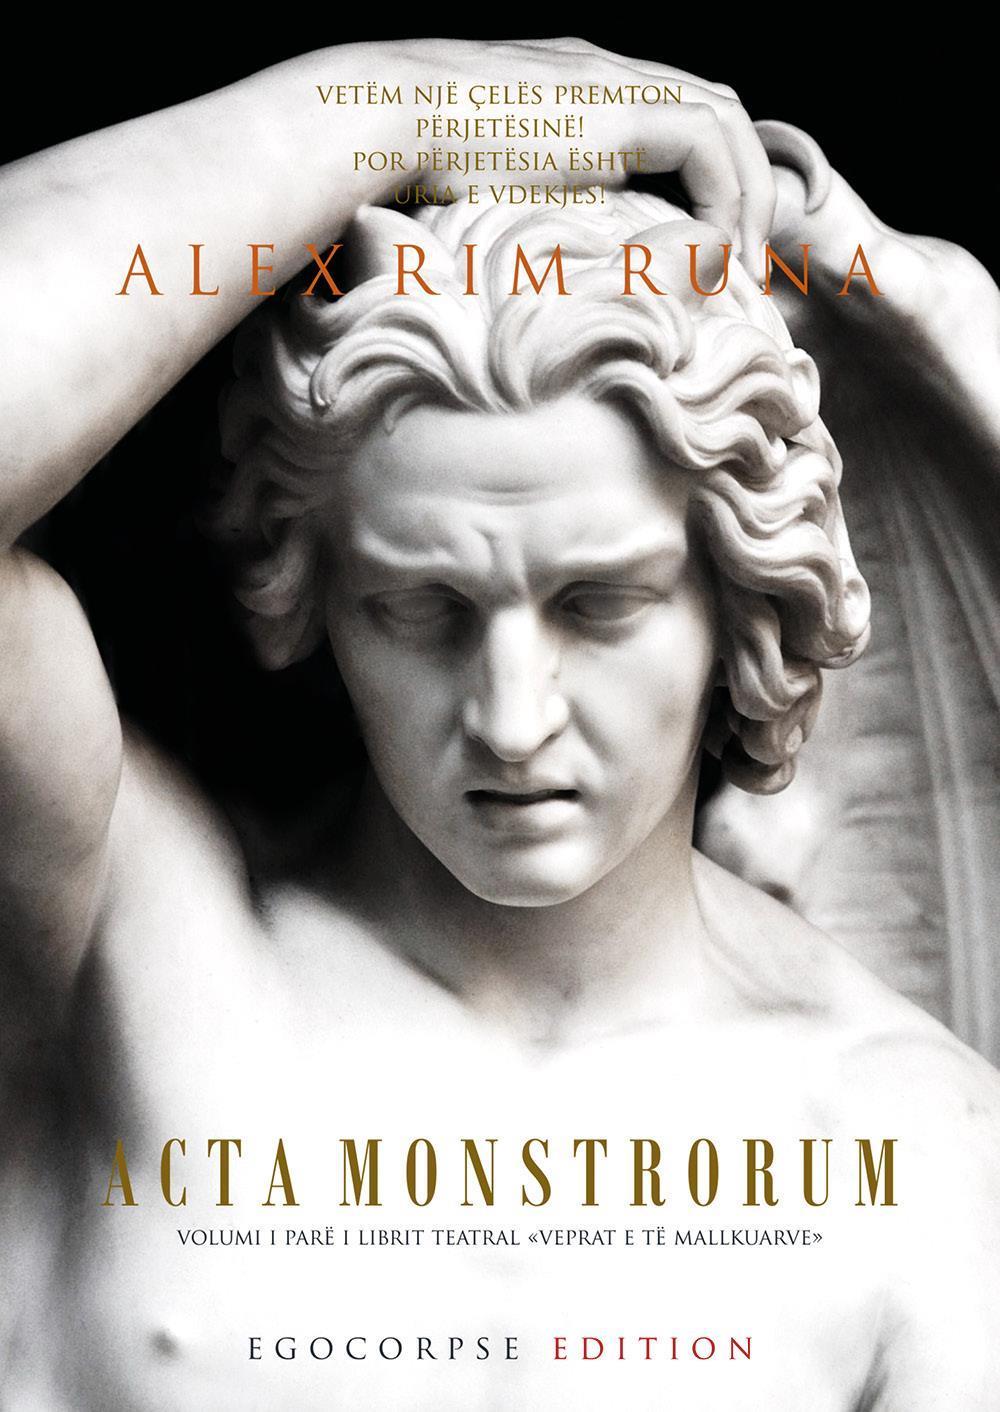 Acta Monstrorum